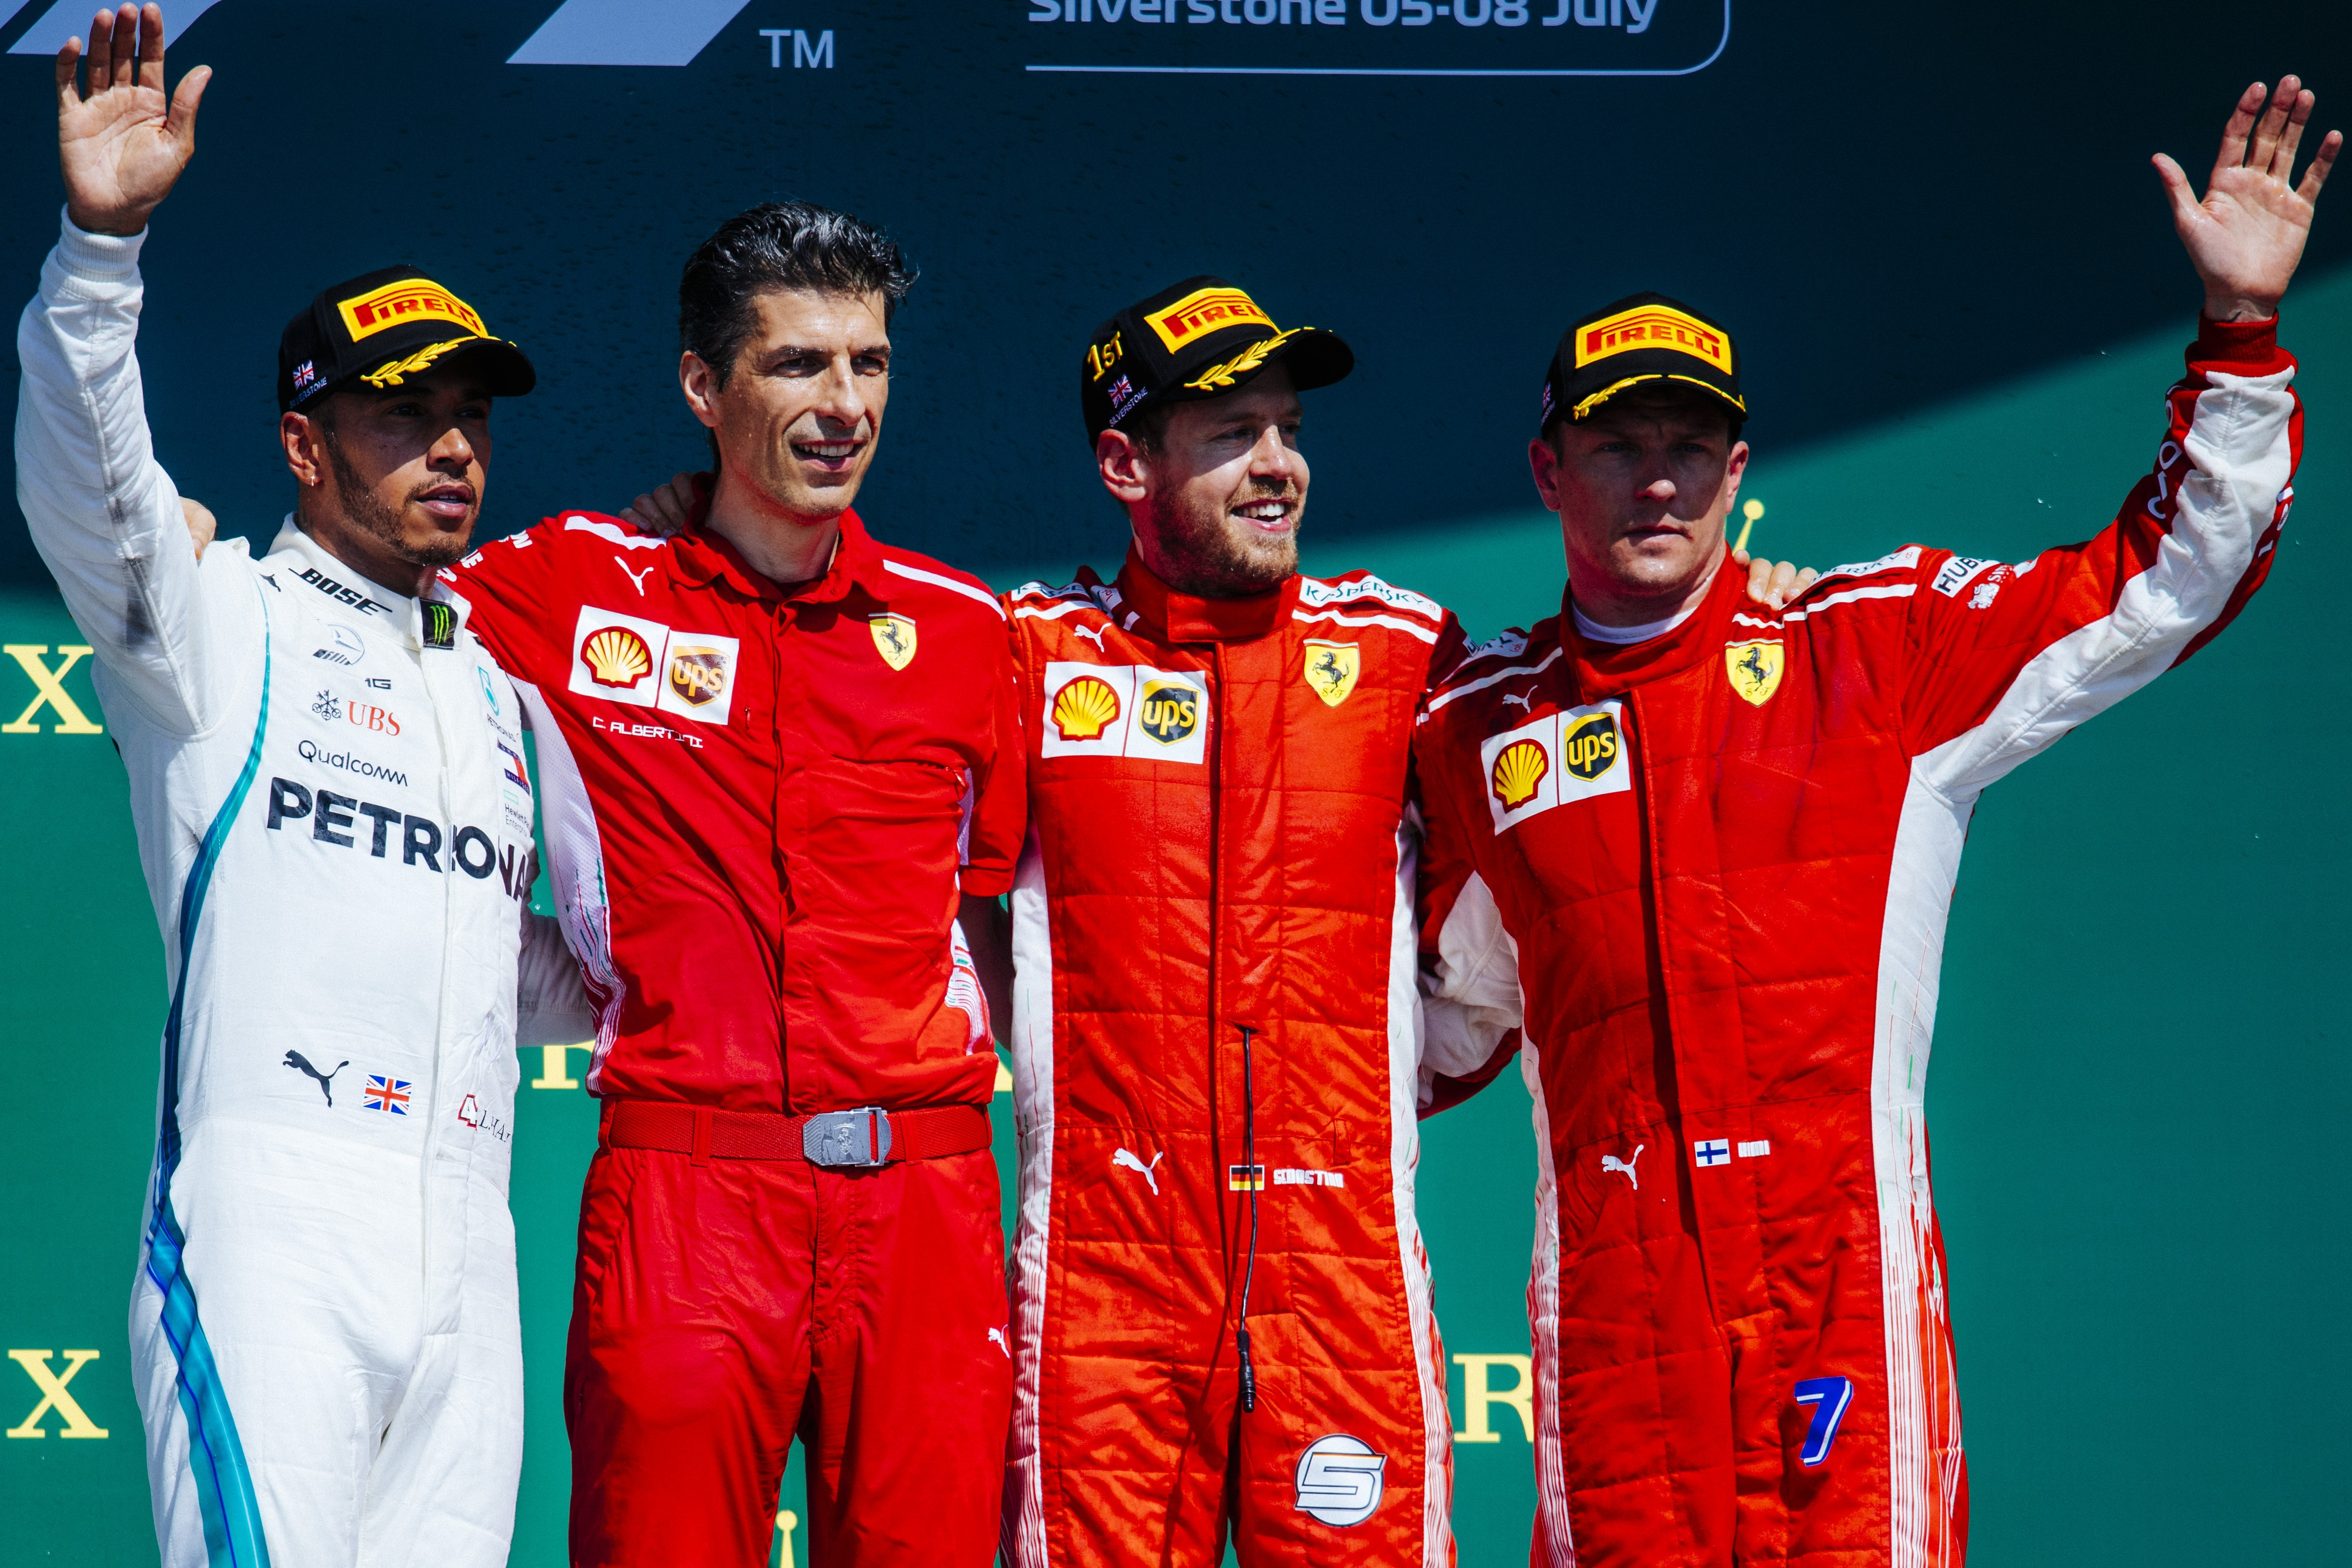 Race results 2018 British F1 grand prix